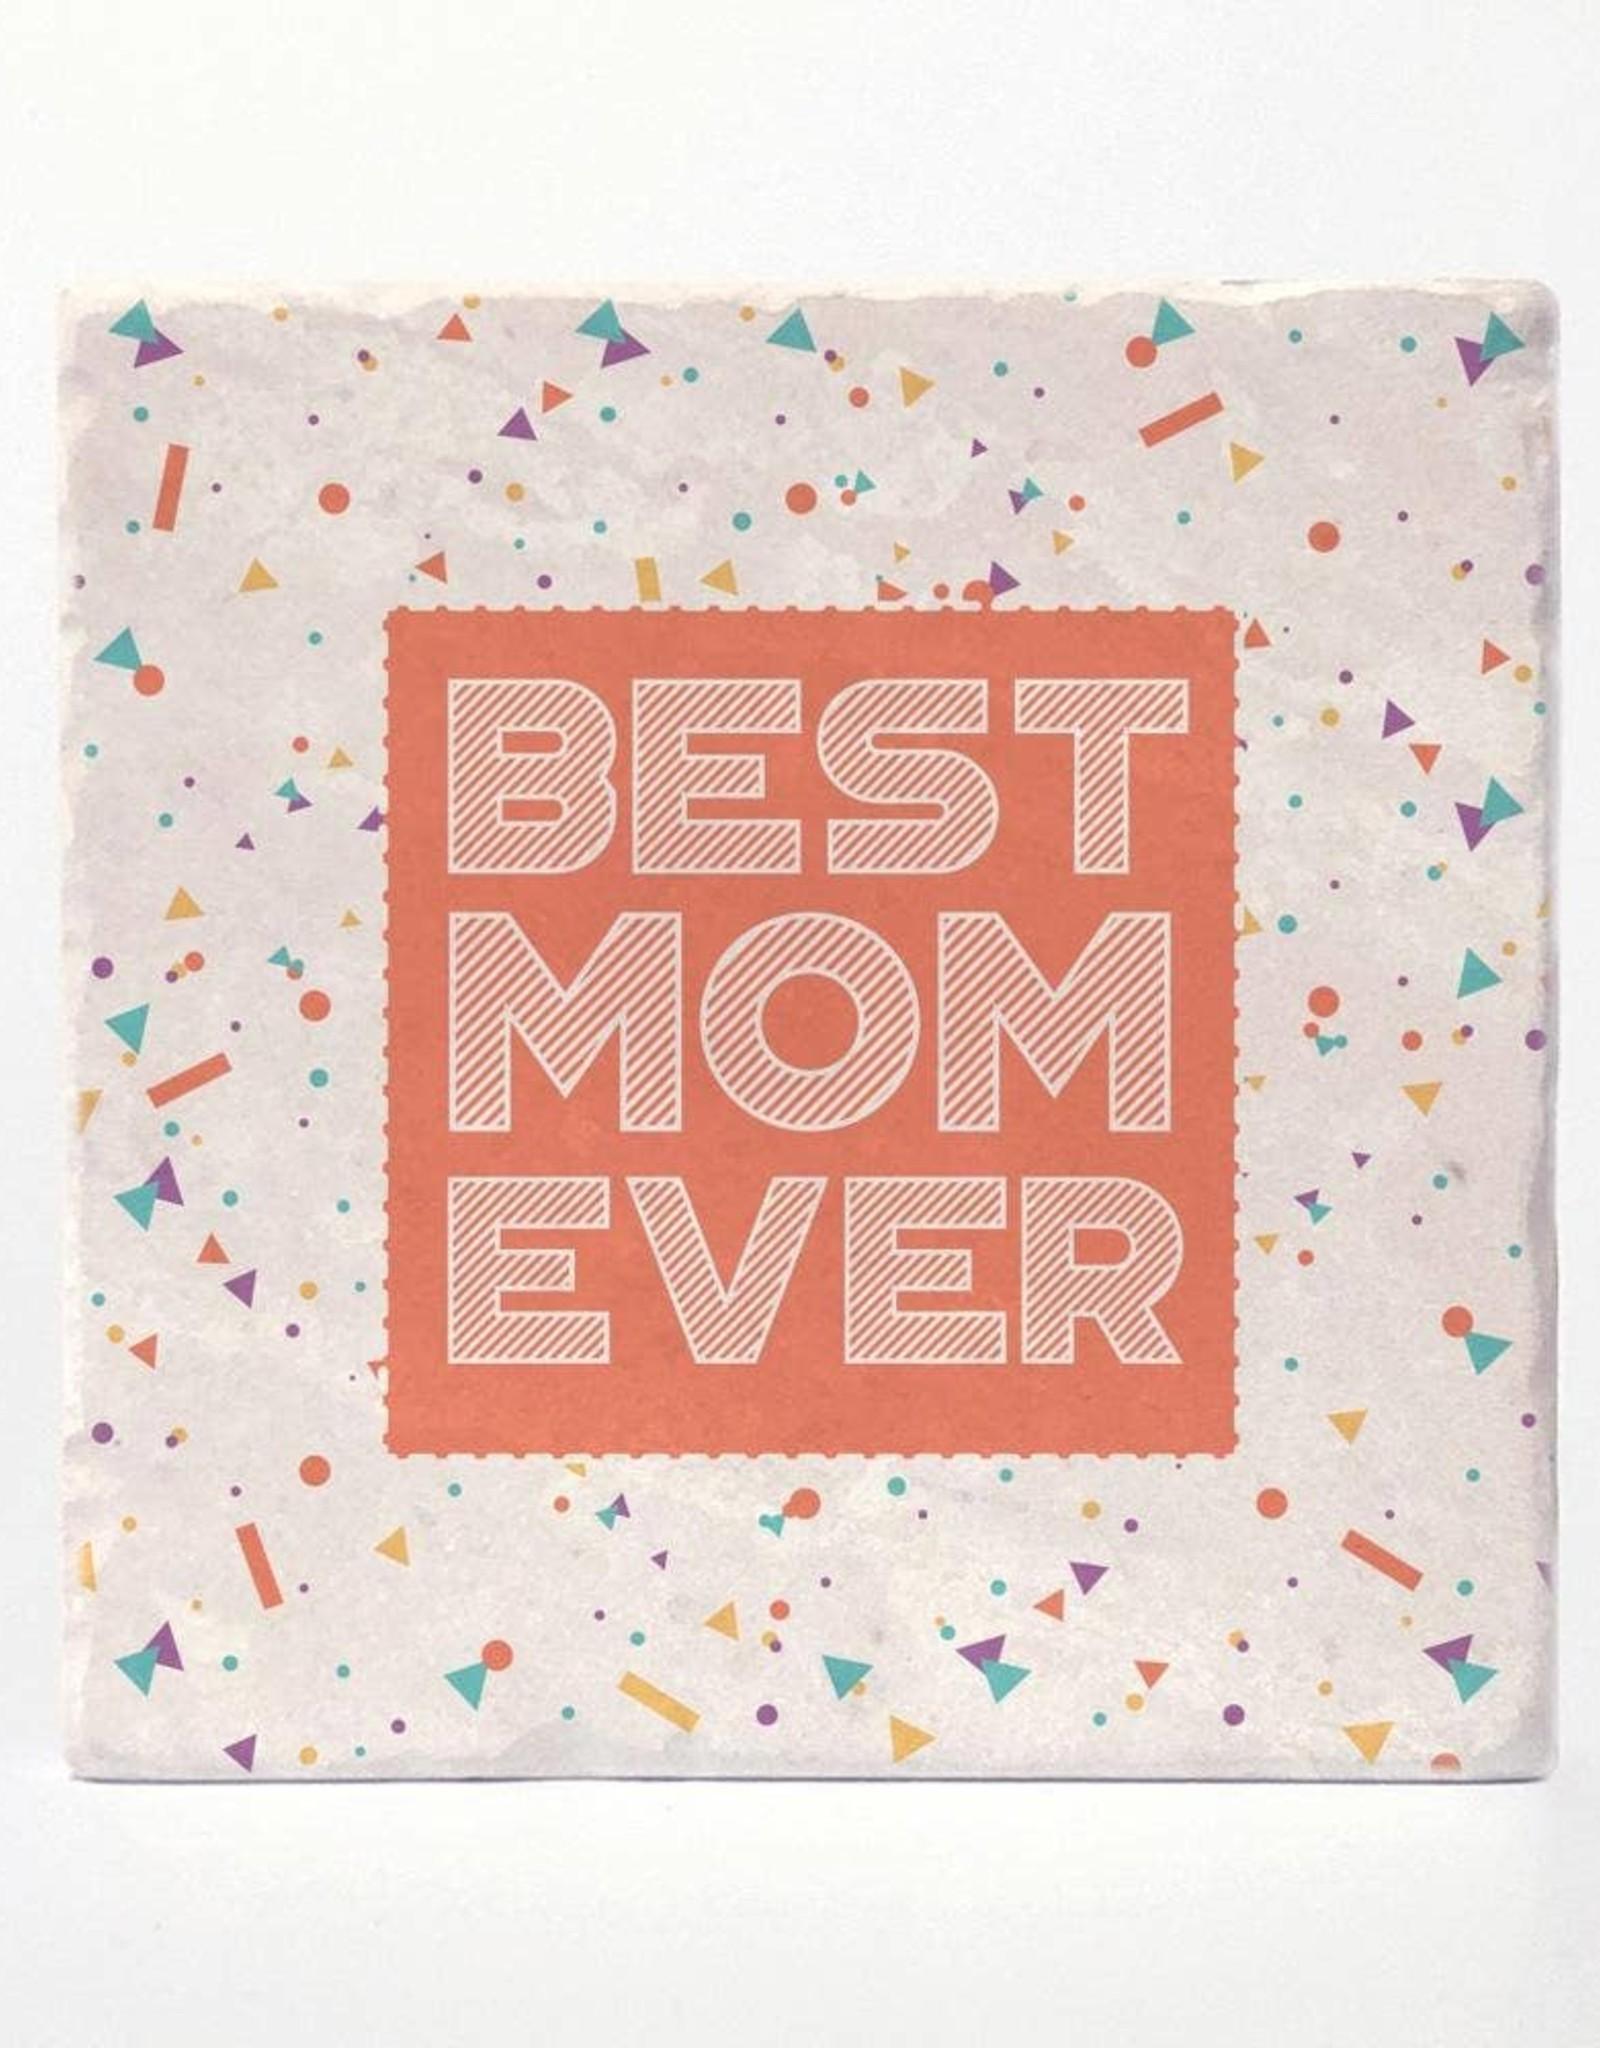 Best Mom Ever Coaster Single - Versatile